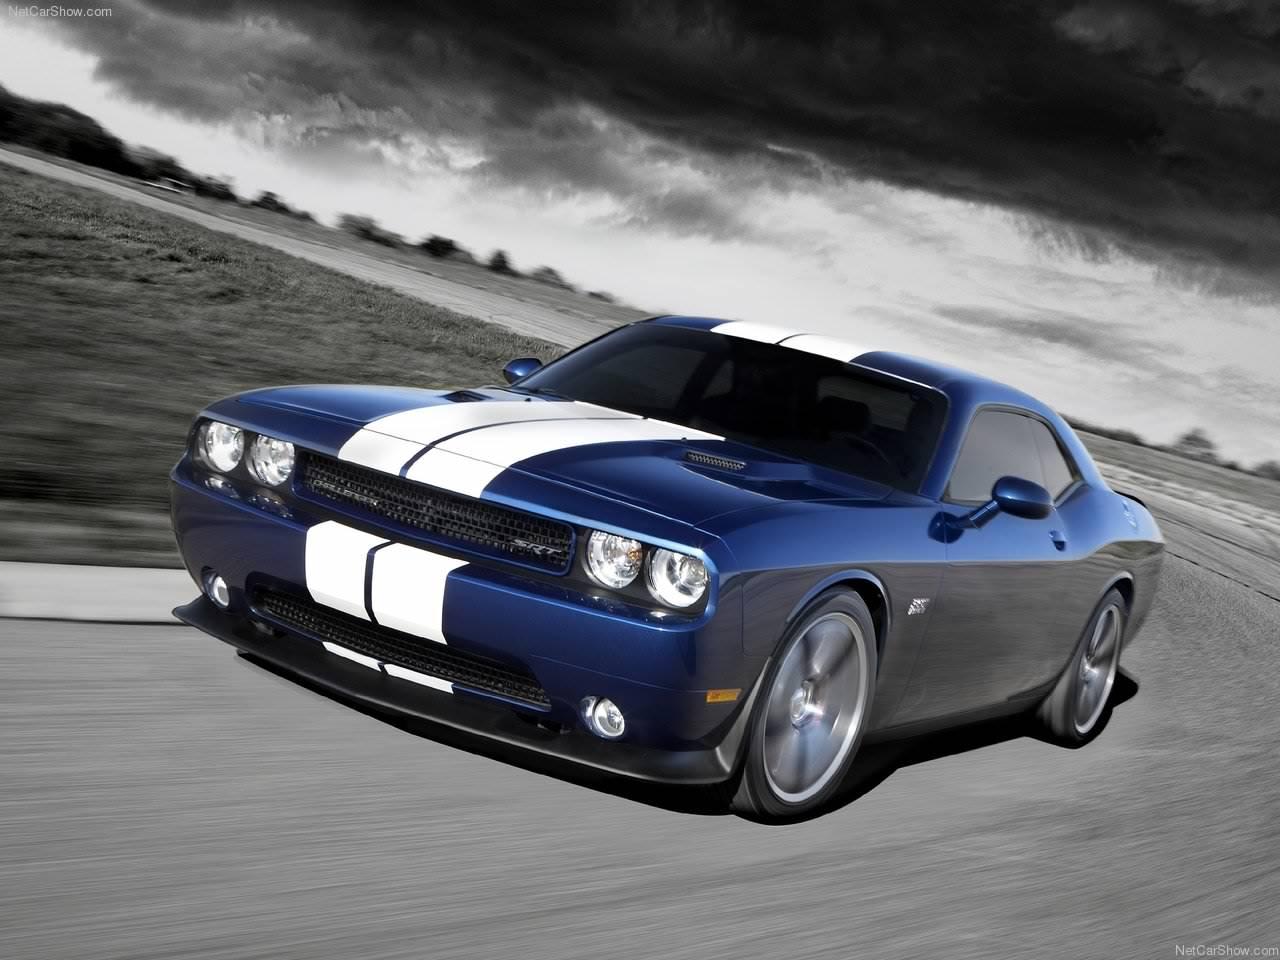 Dodge 2012 Challenger Image